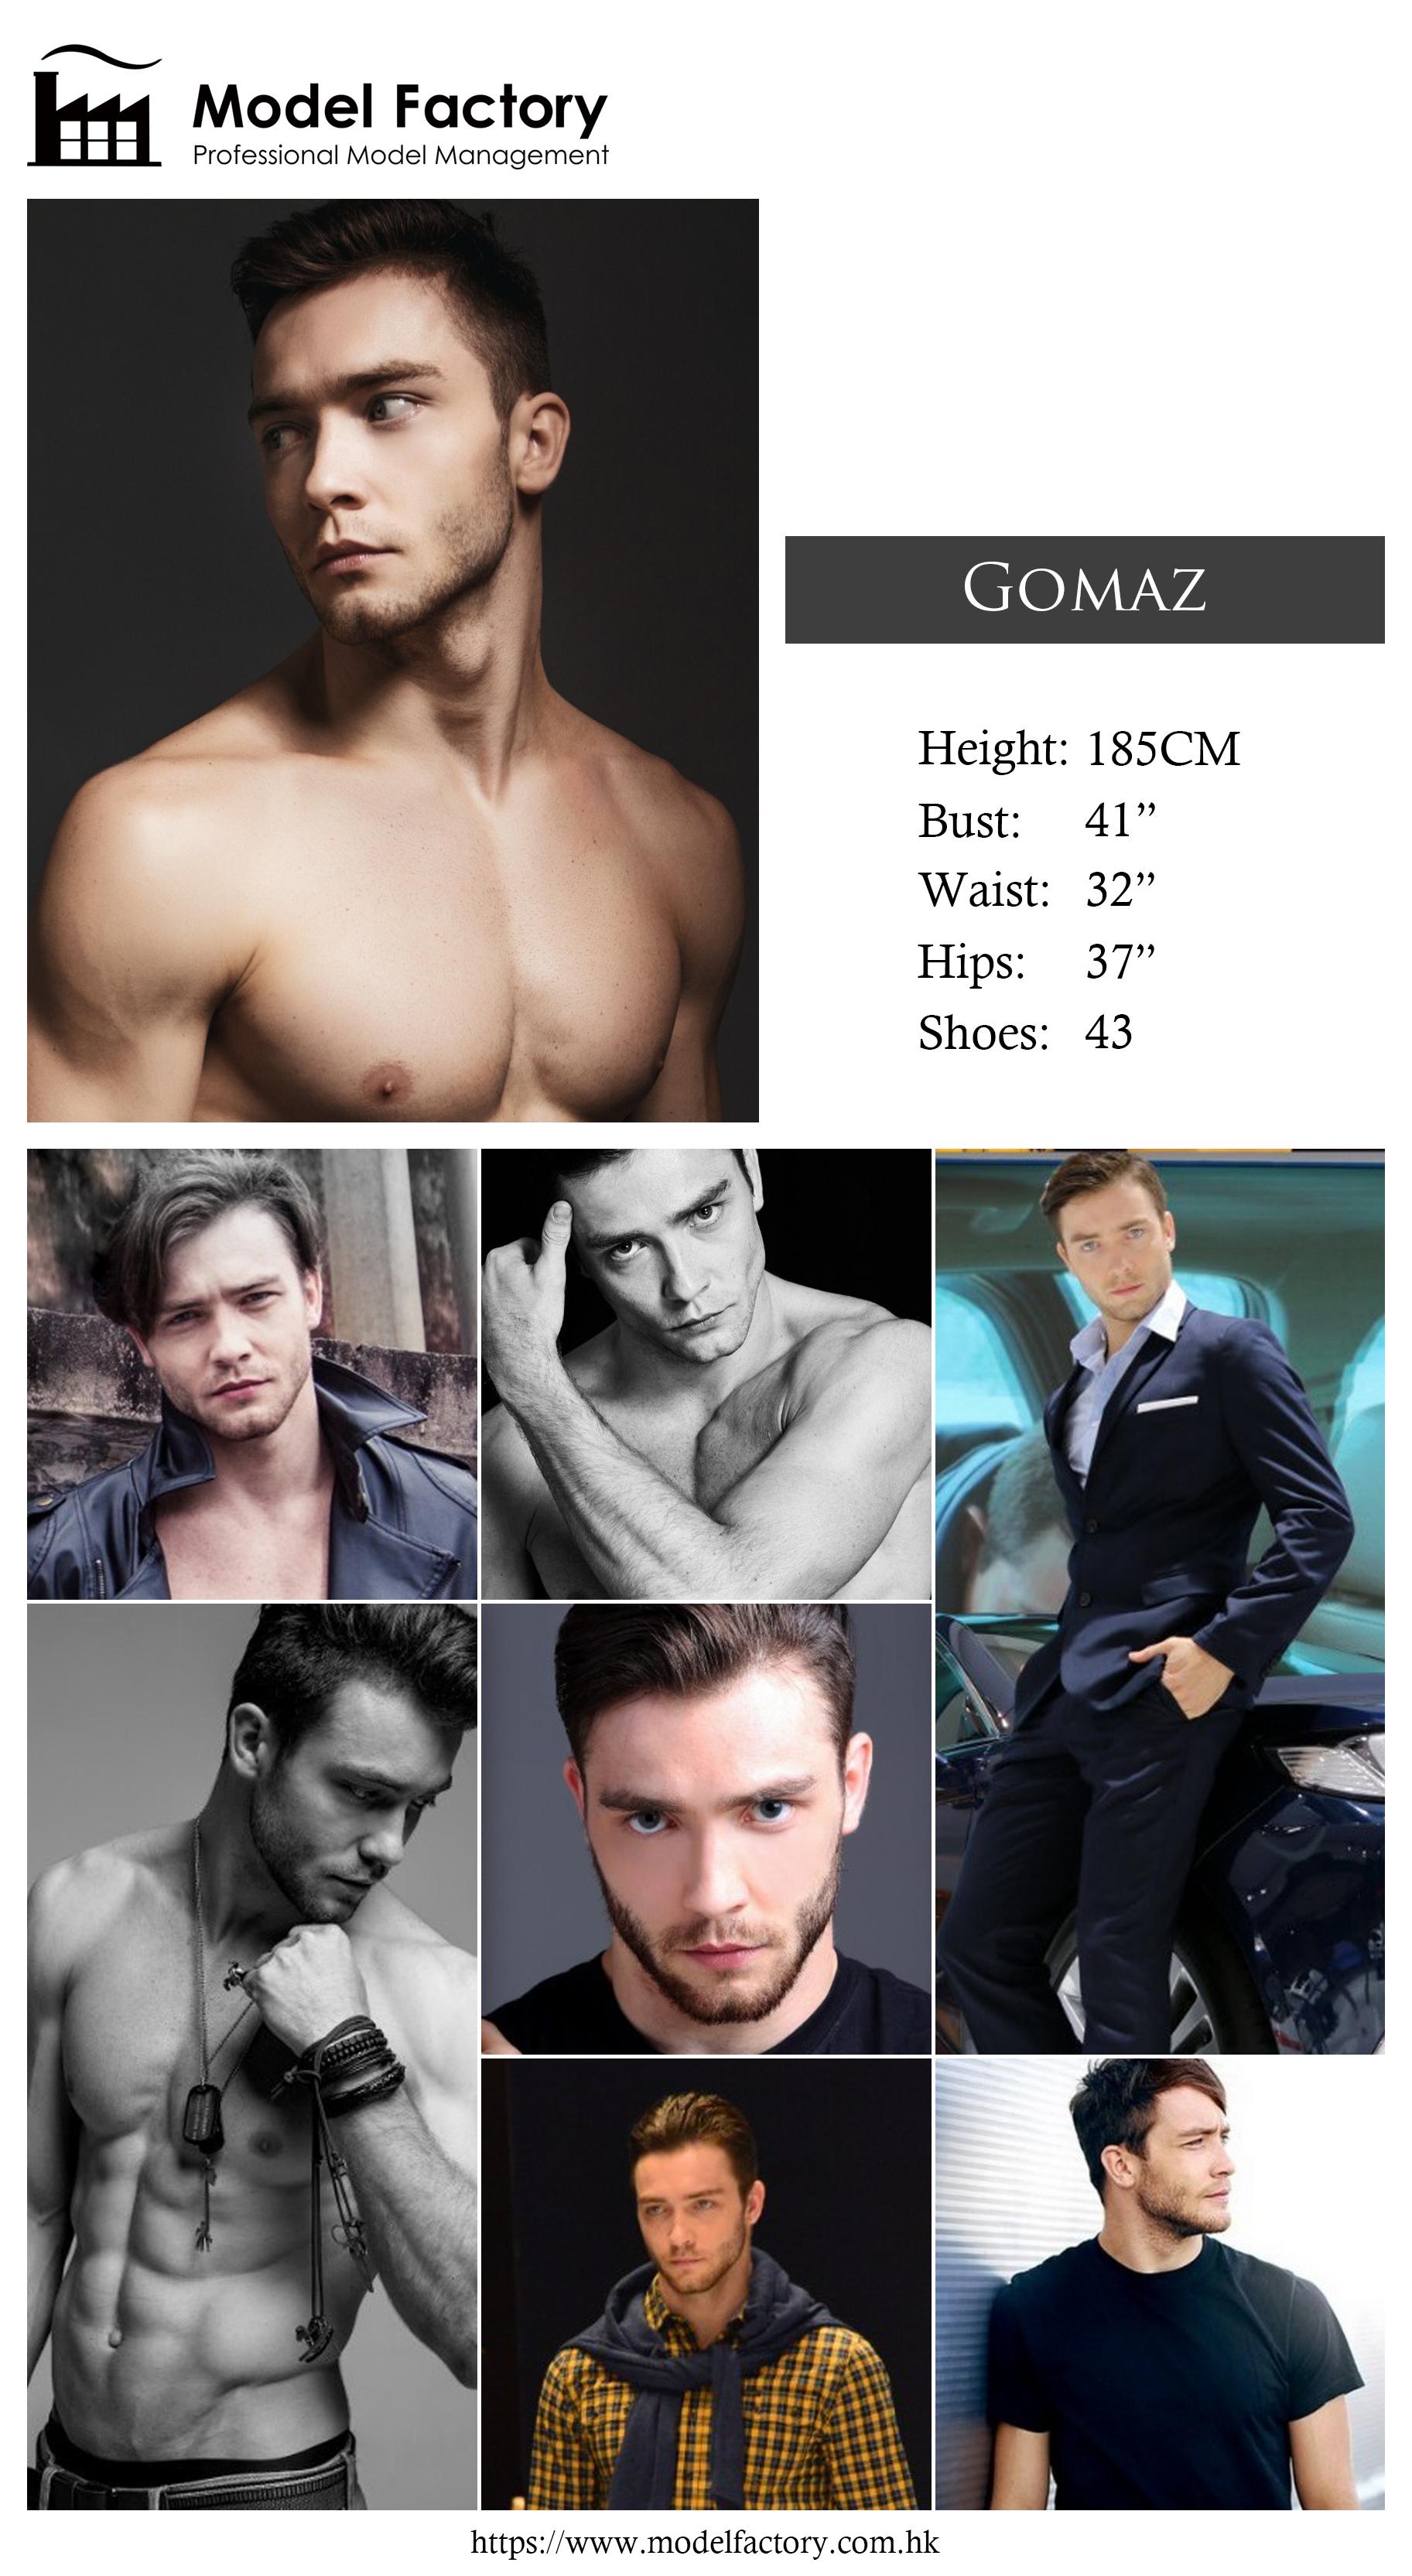 Model Factory Caucasian Male Model Gomaz